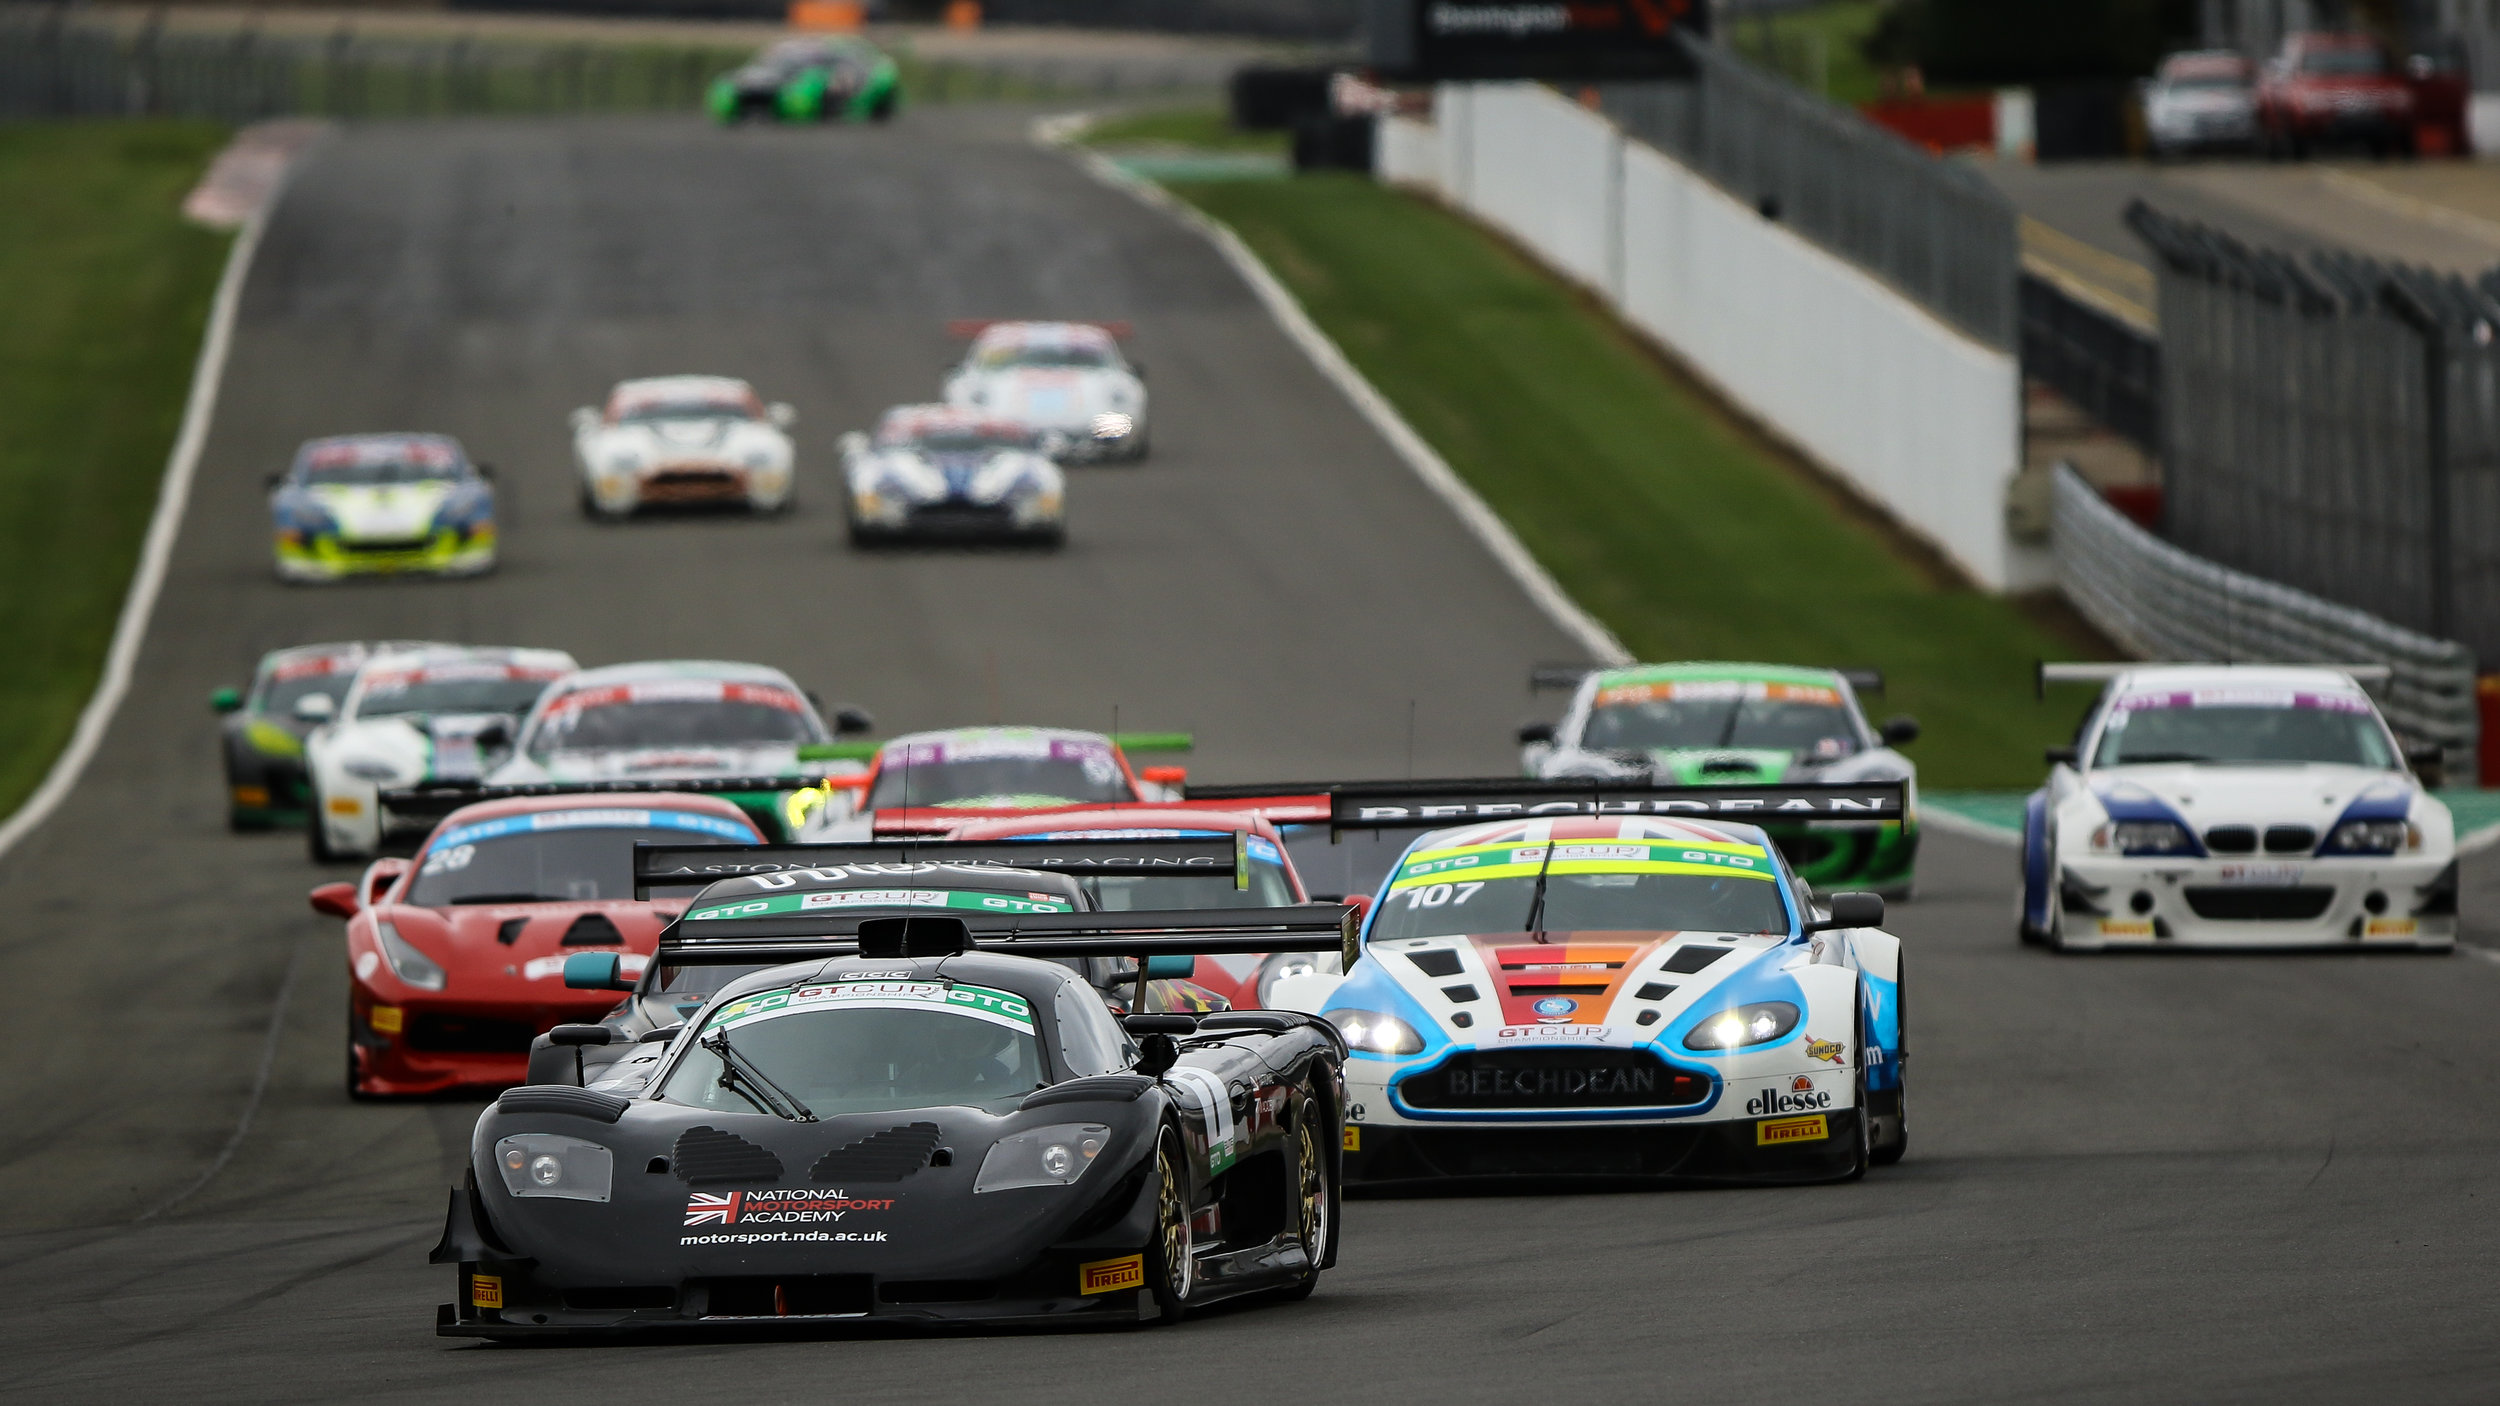 GT CUP - Donington Park Grand Prix Circuit 2018